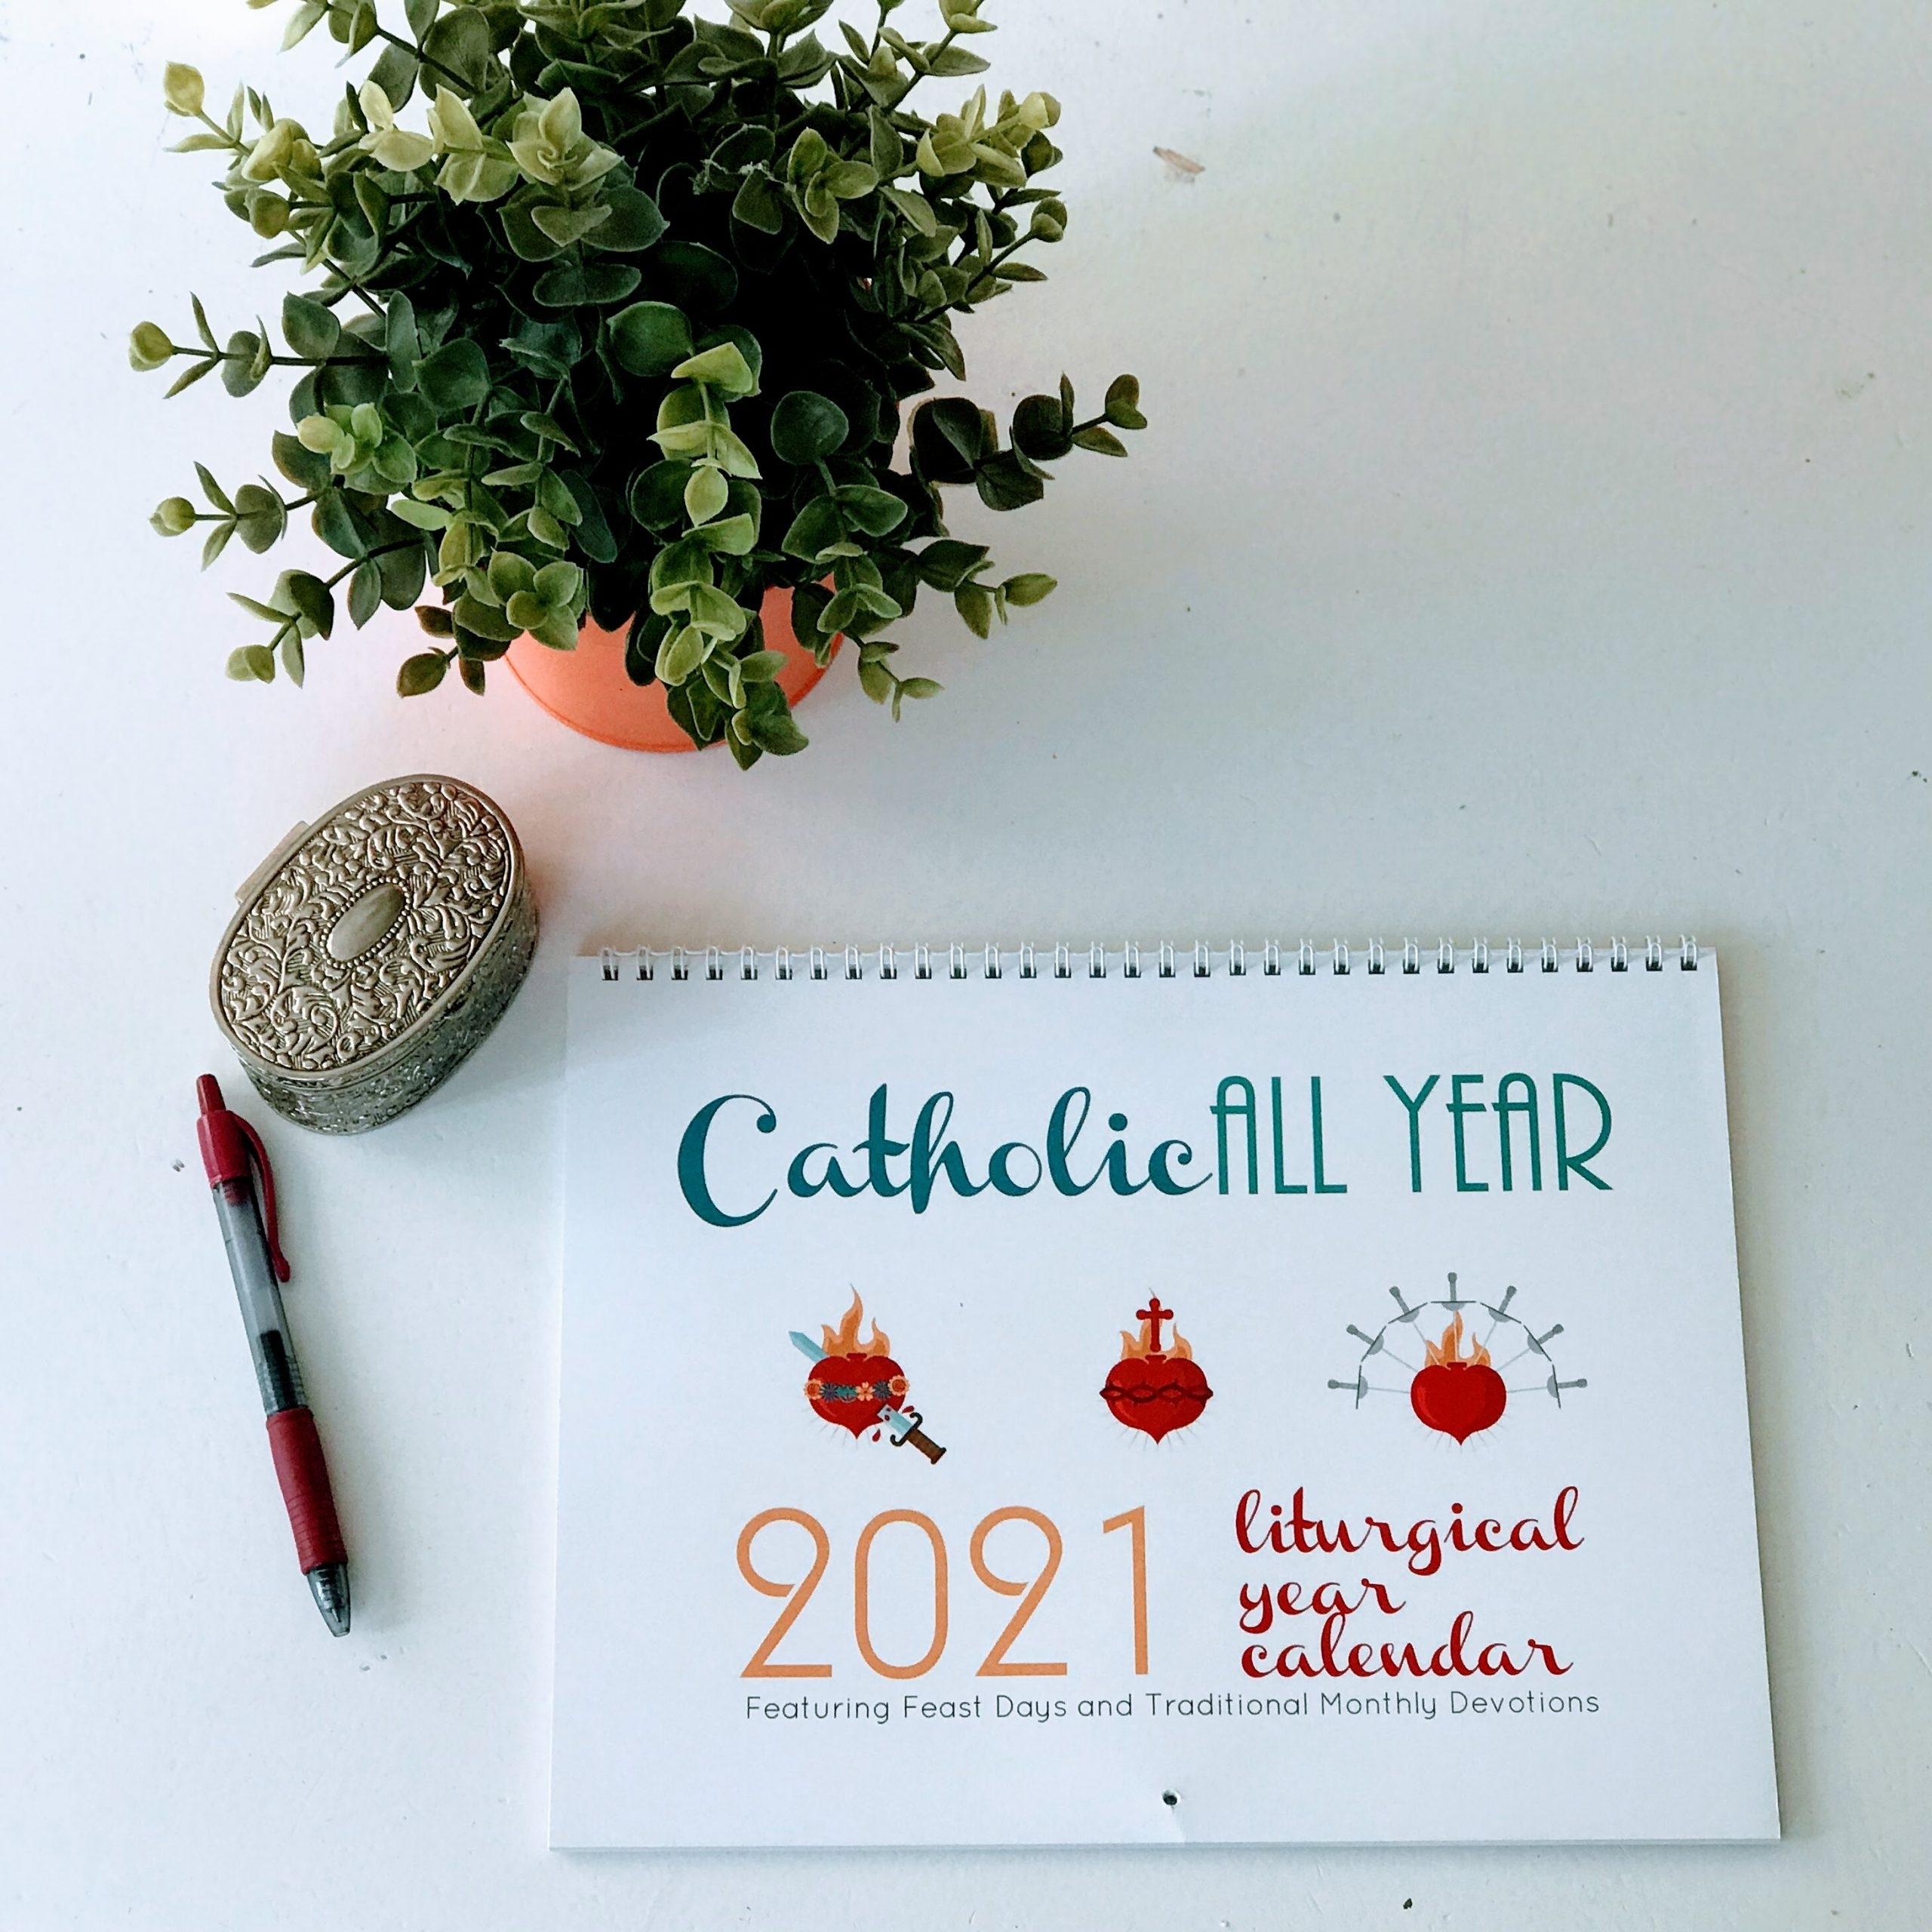 Catholic All Year 2021 Liturgical Calendar With Monthly Devotion Art  *Digital Download* Catholic Calendar 2021 Poster